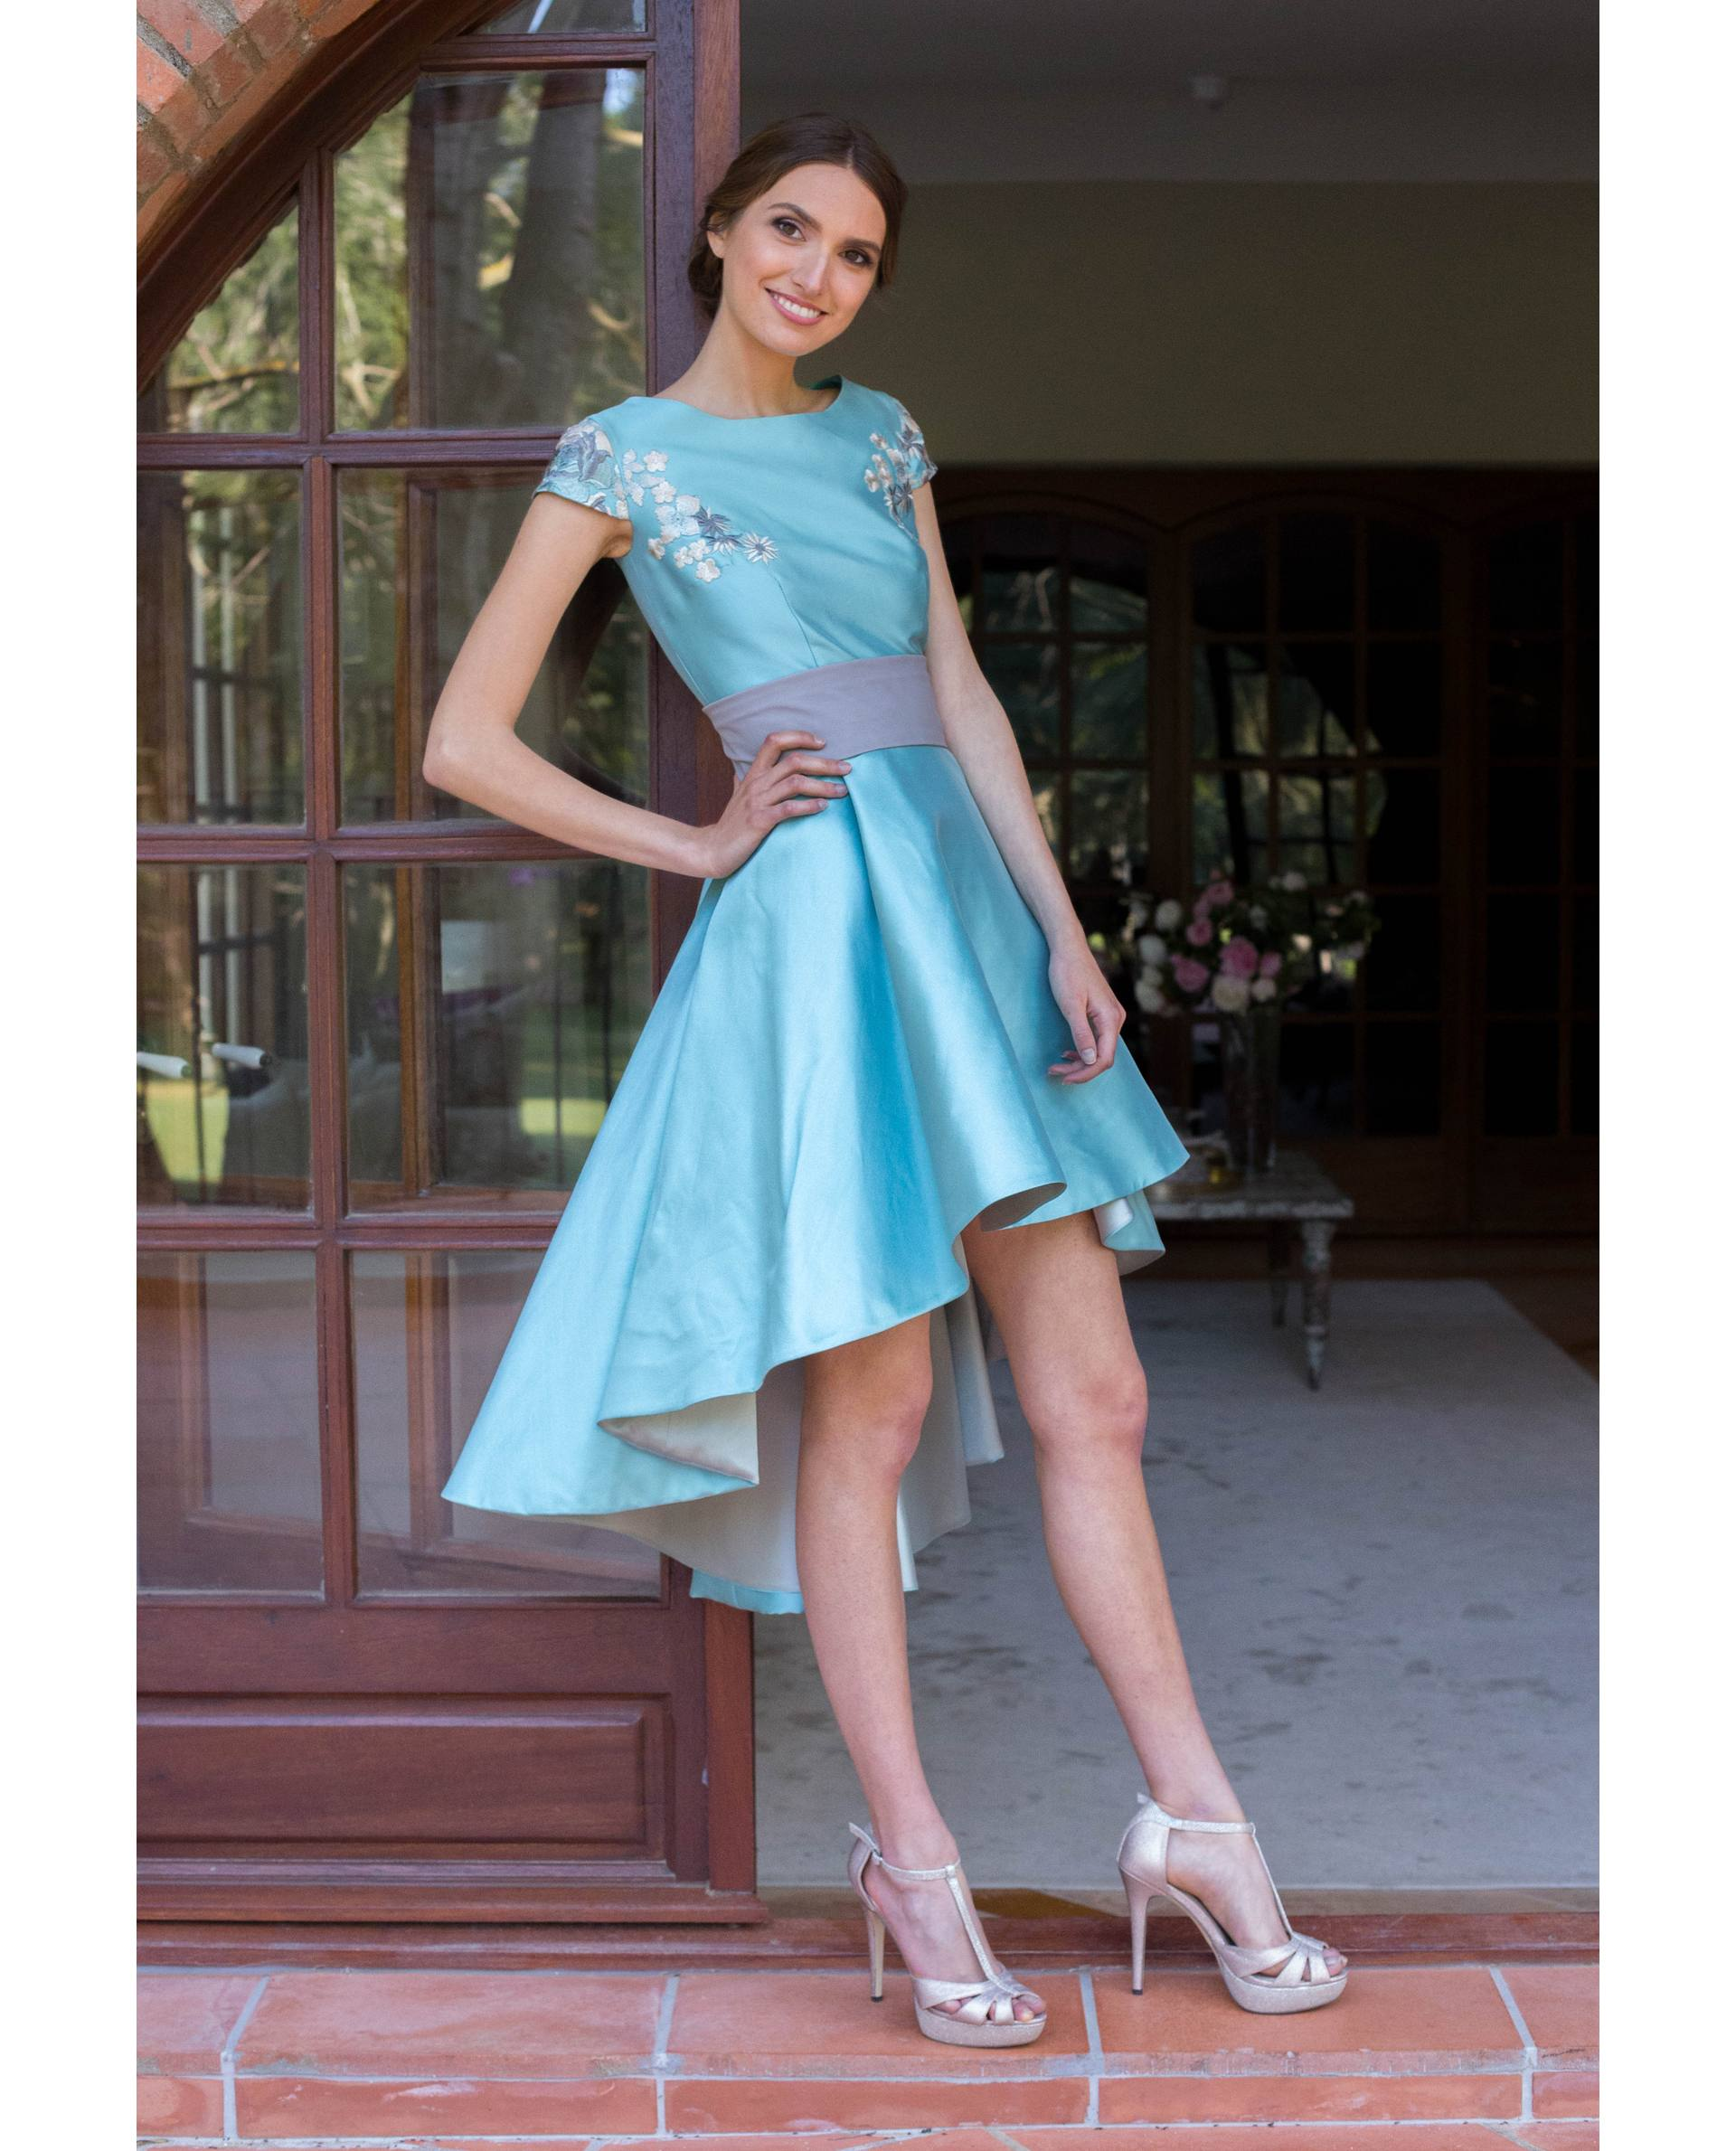 ATELIER-NATURE 2018/19 - VESTIDOS - vestido fiesta LIA azul